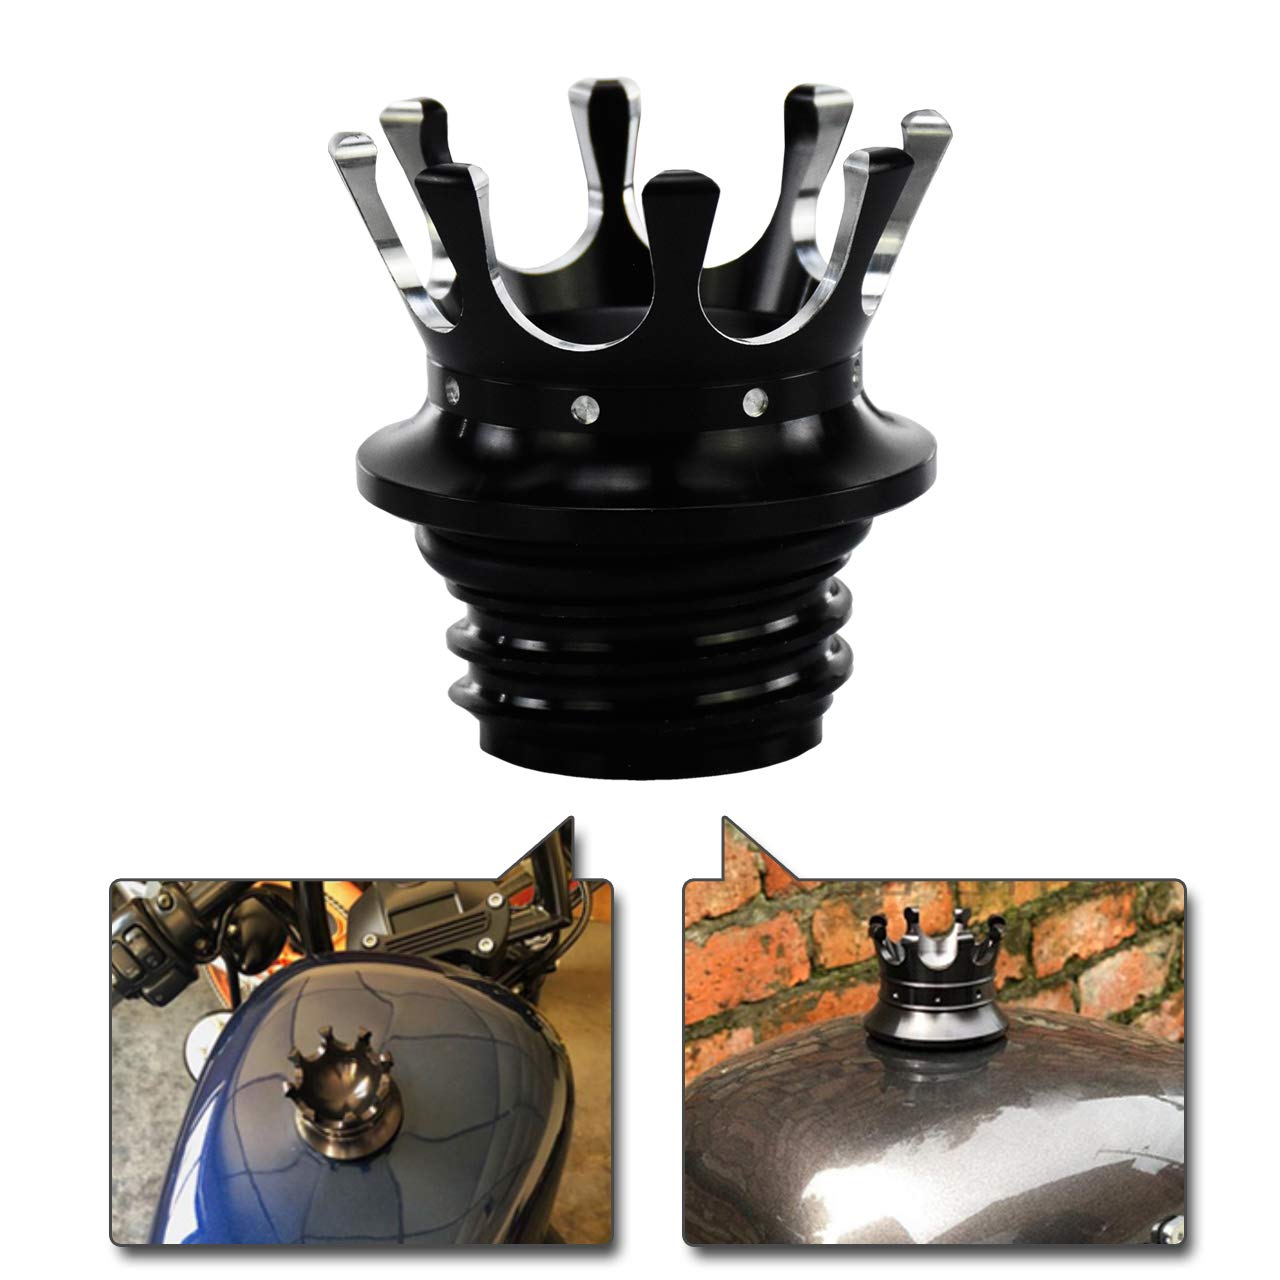 REBACKER King Crown Gas Cap Fuel Tank Right-hand Thread Billet Aluminum Fit For Harley Sportster Dyna Touring Road King Softail Trike Freewheeler FLRT Chrome